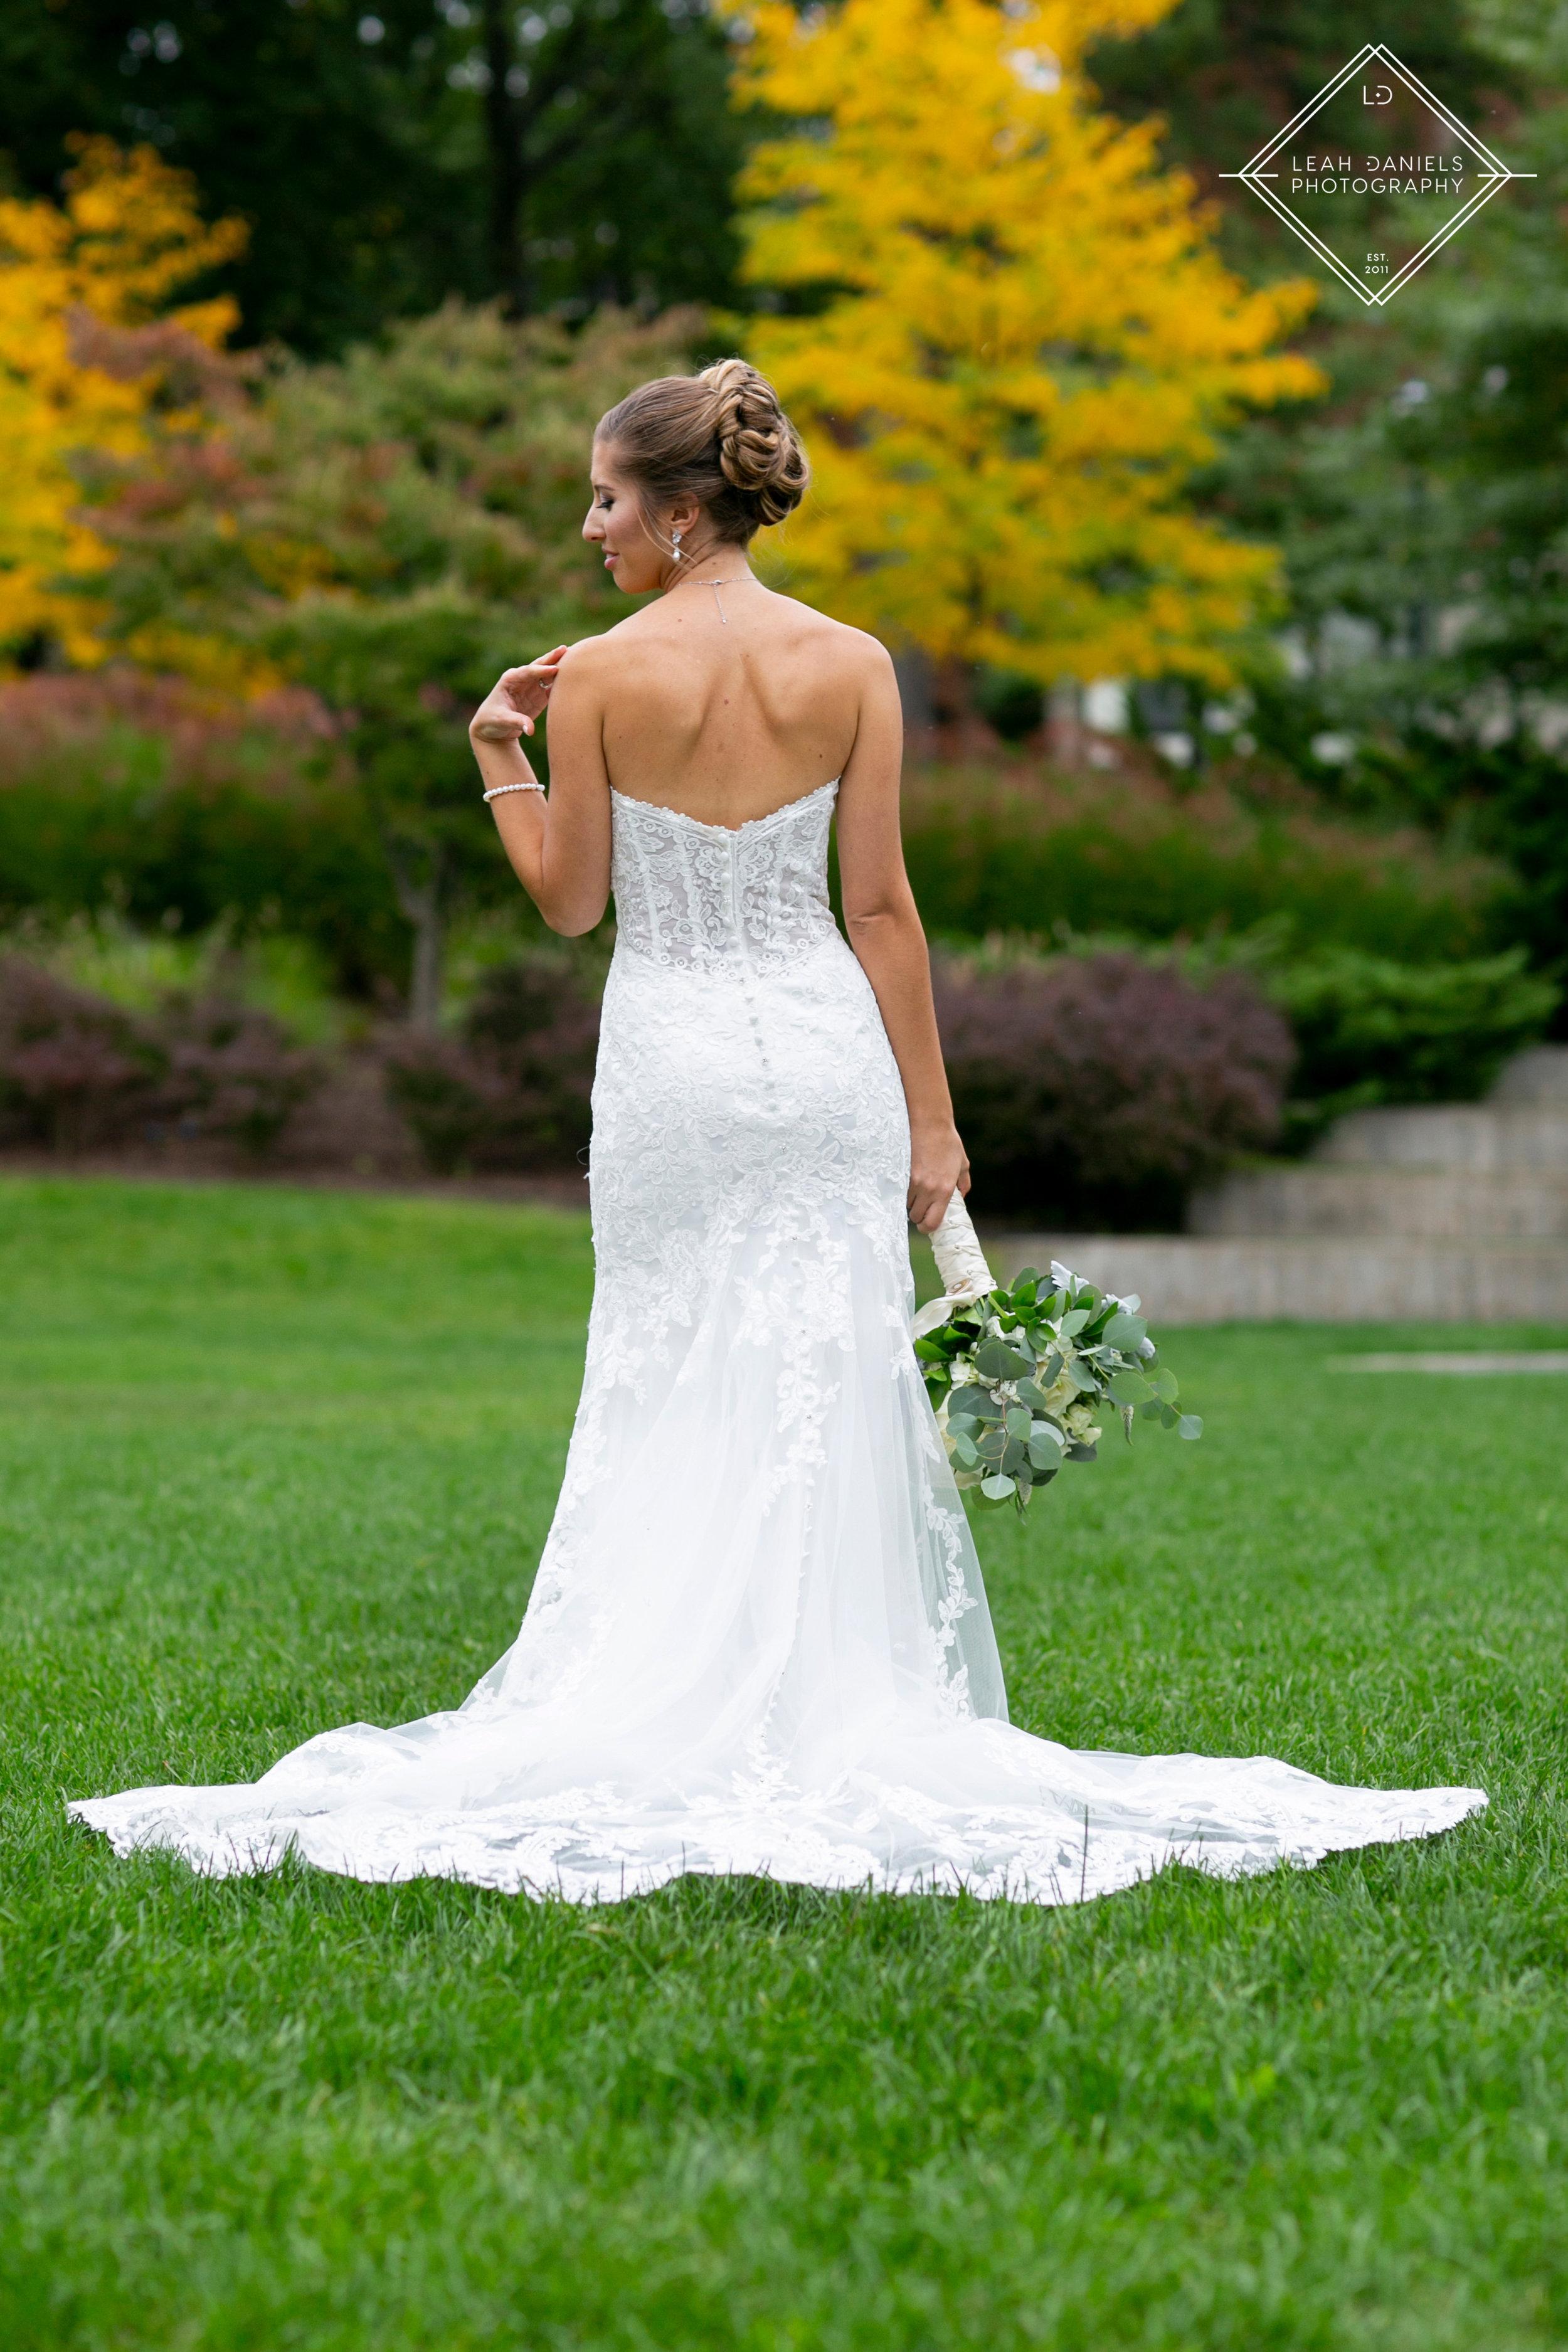 University of Scranton Wedding - Dione Green